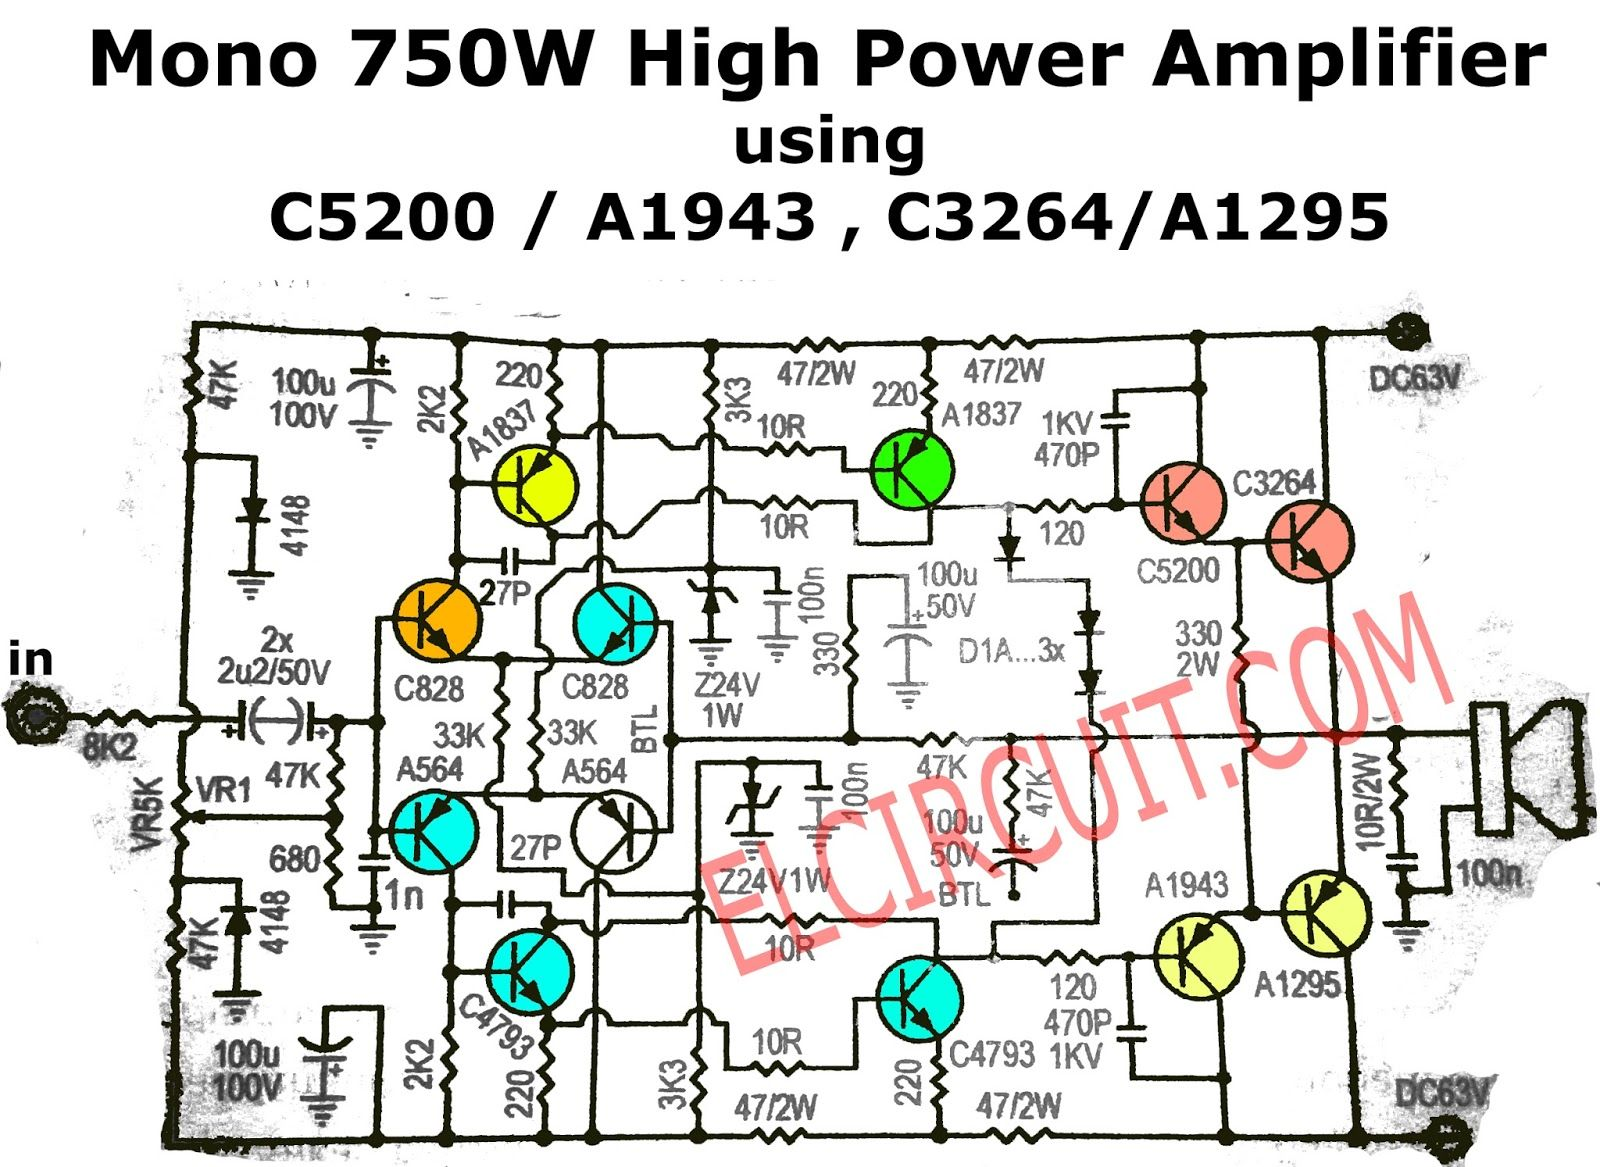 hight resolution of 750w mono power amplifier schematic diagram